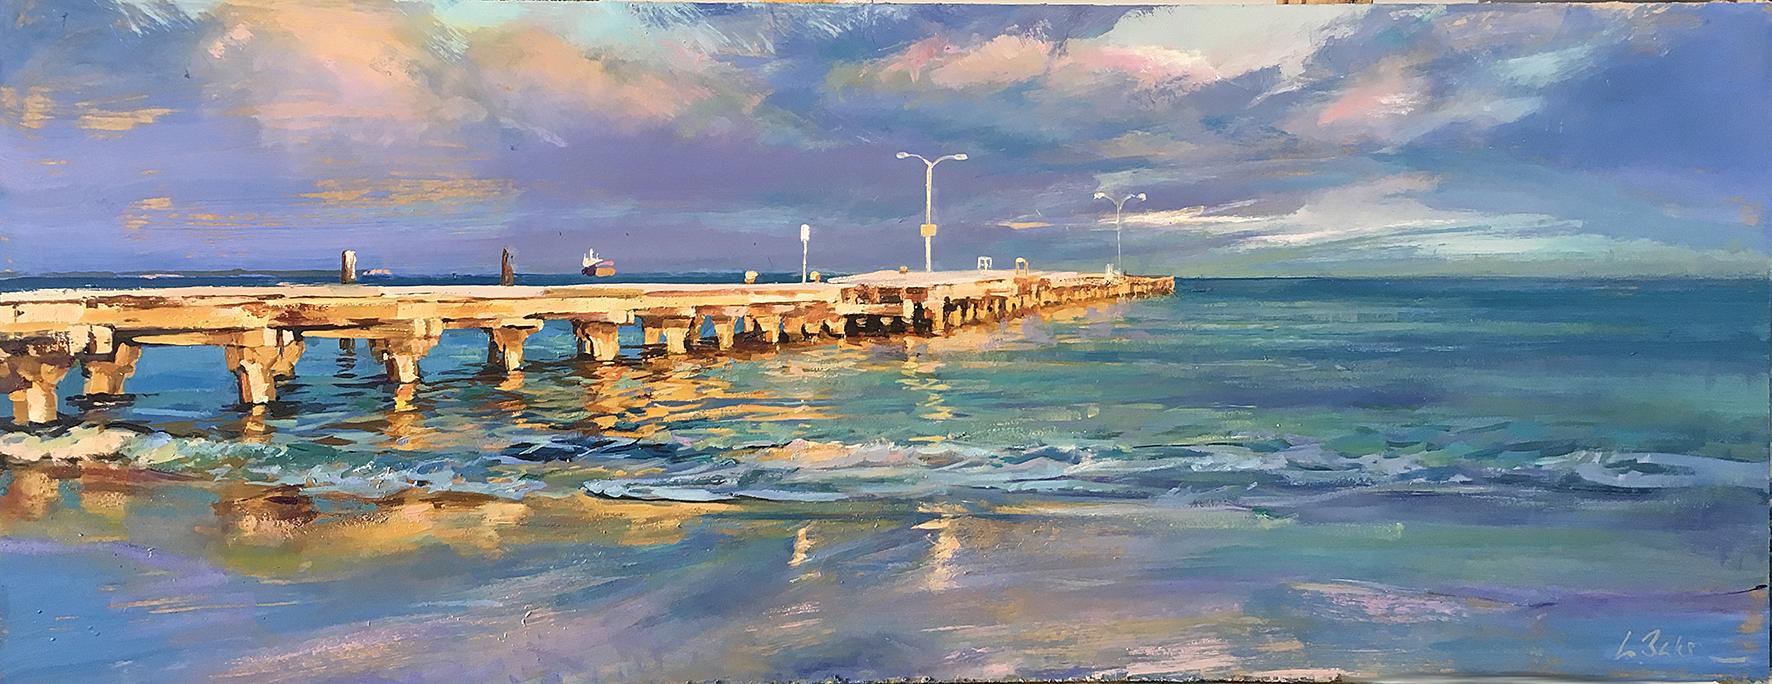 Greg Baker - First Light on Woodman Point Jetty (oil on board, 35 x 60 cms)